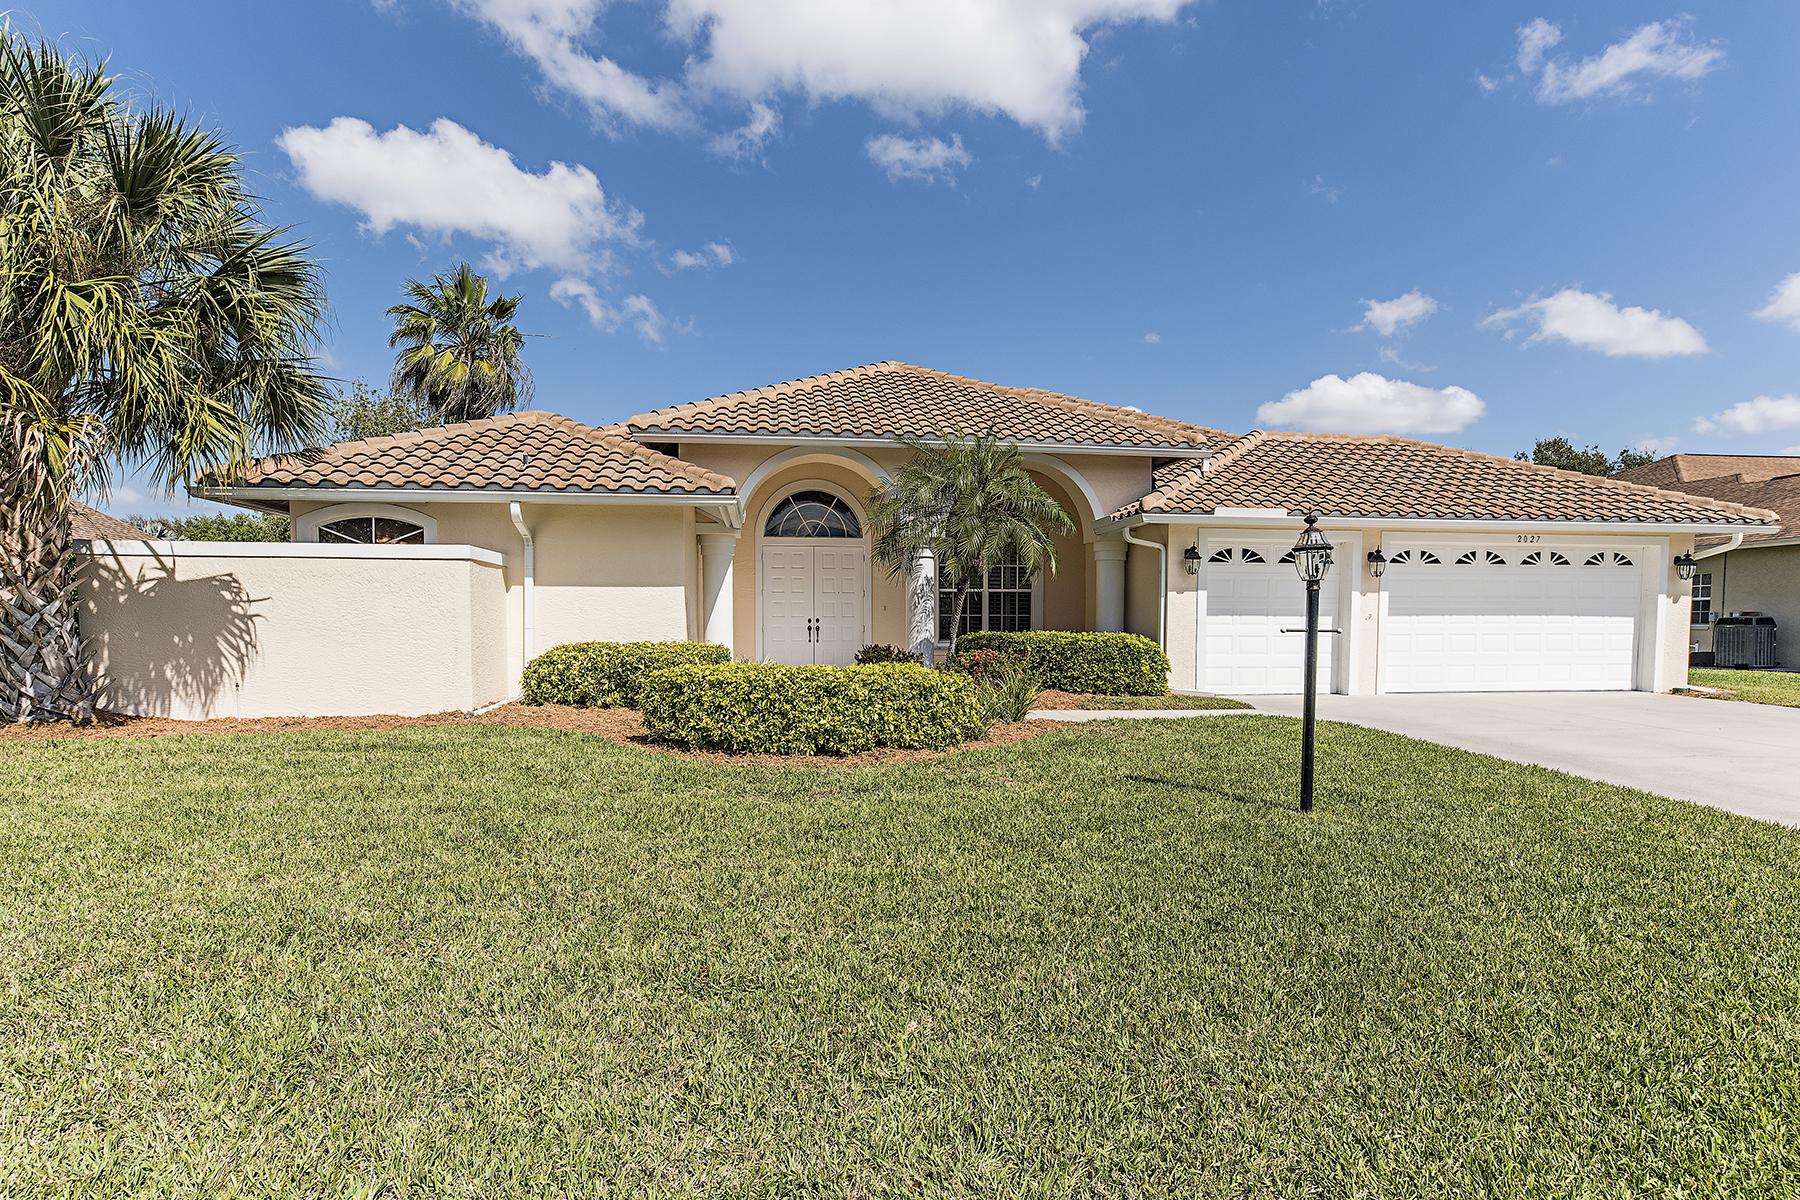 Single Family Home for Sale at Naples 2027 Teagarden Ln Naples, Florida, 34110 United States